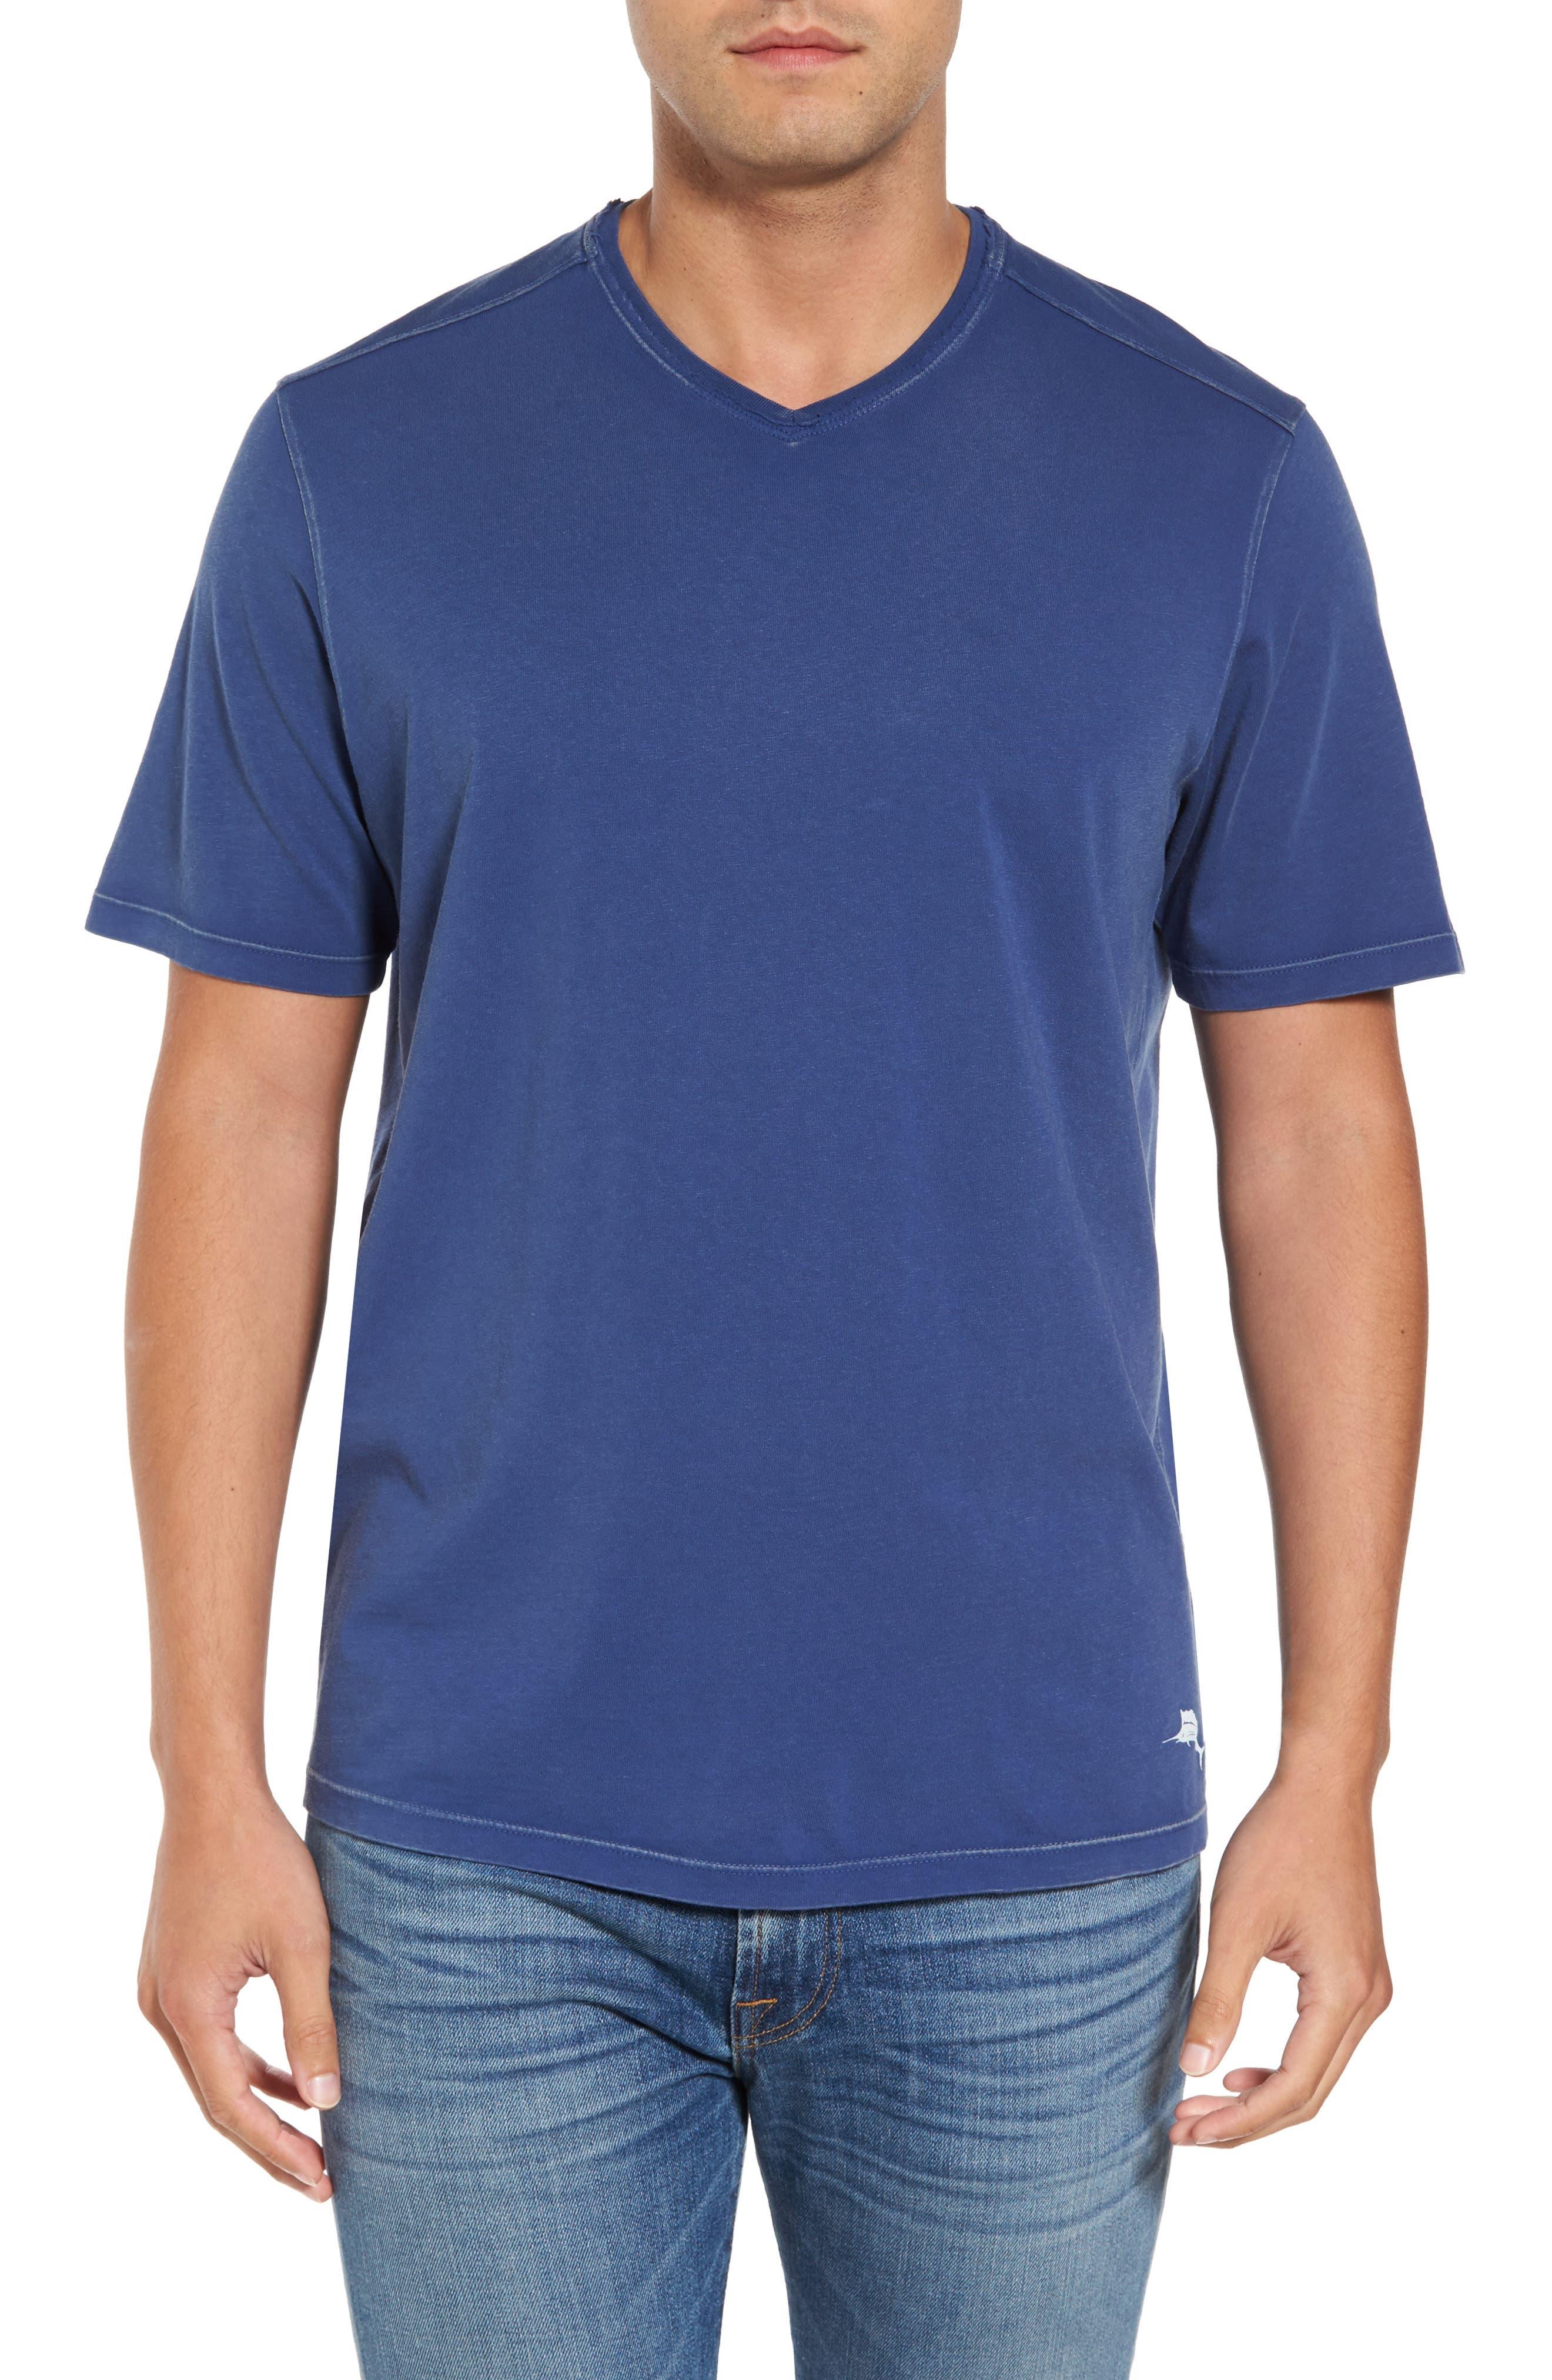 TOMMY BAHAMA Kahuna V-Neck T-Shirt